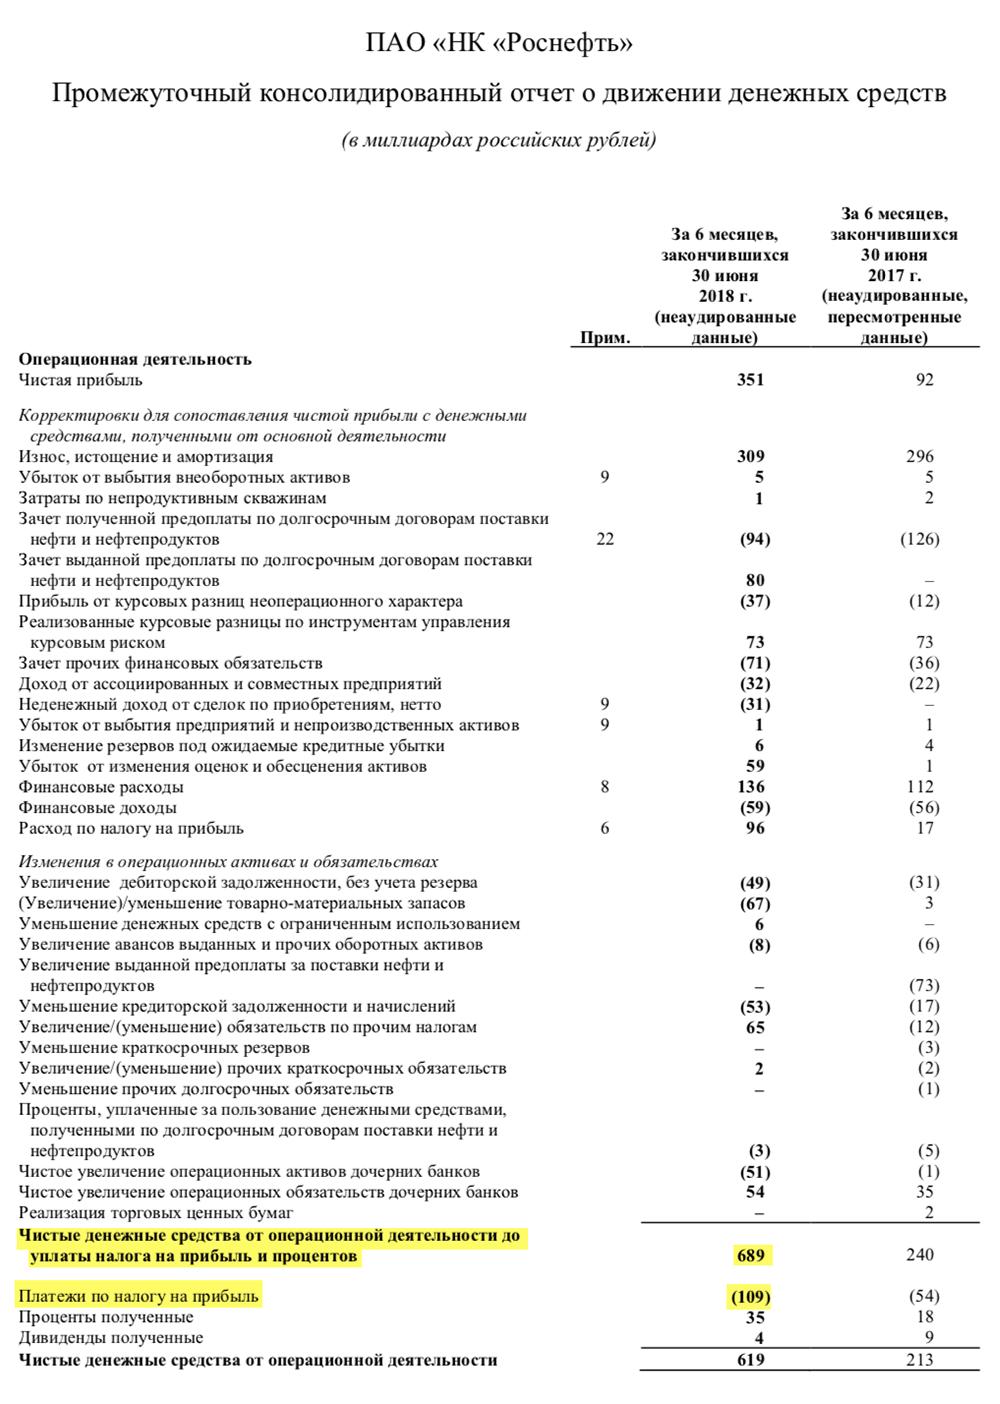 Страница 9 отчета «Роснефти» за 2 квартал 2018 года